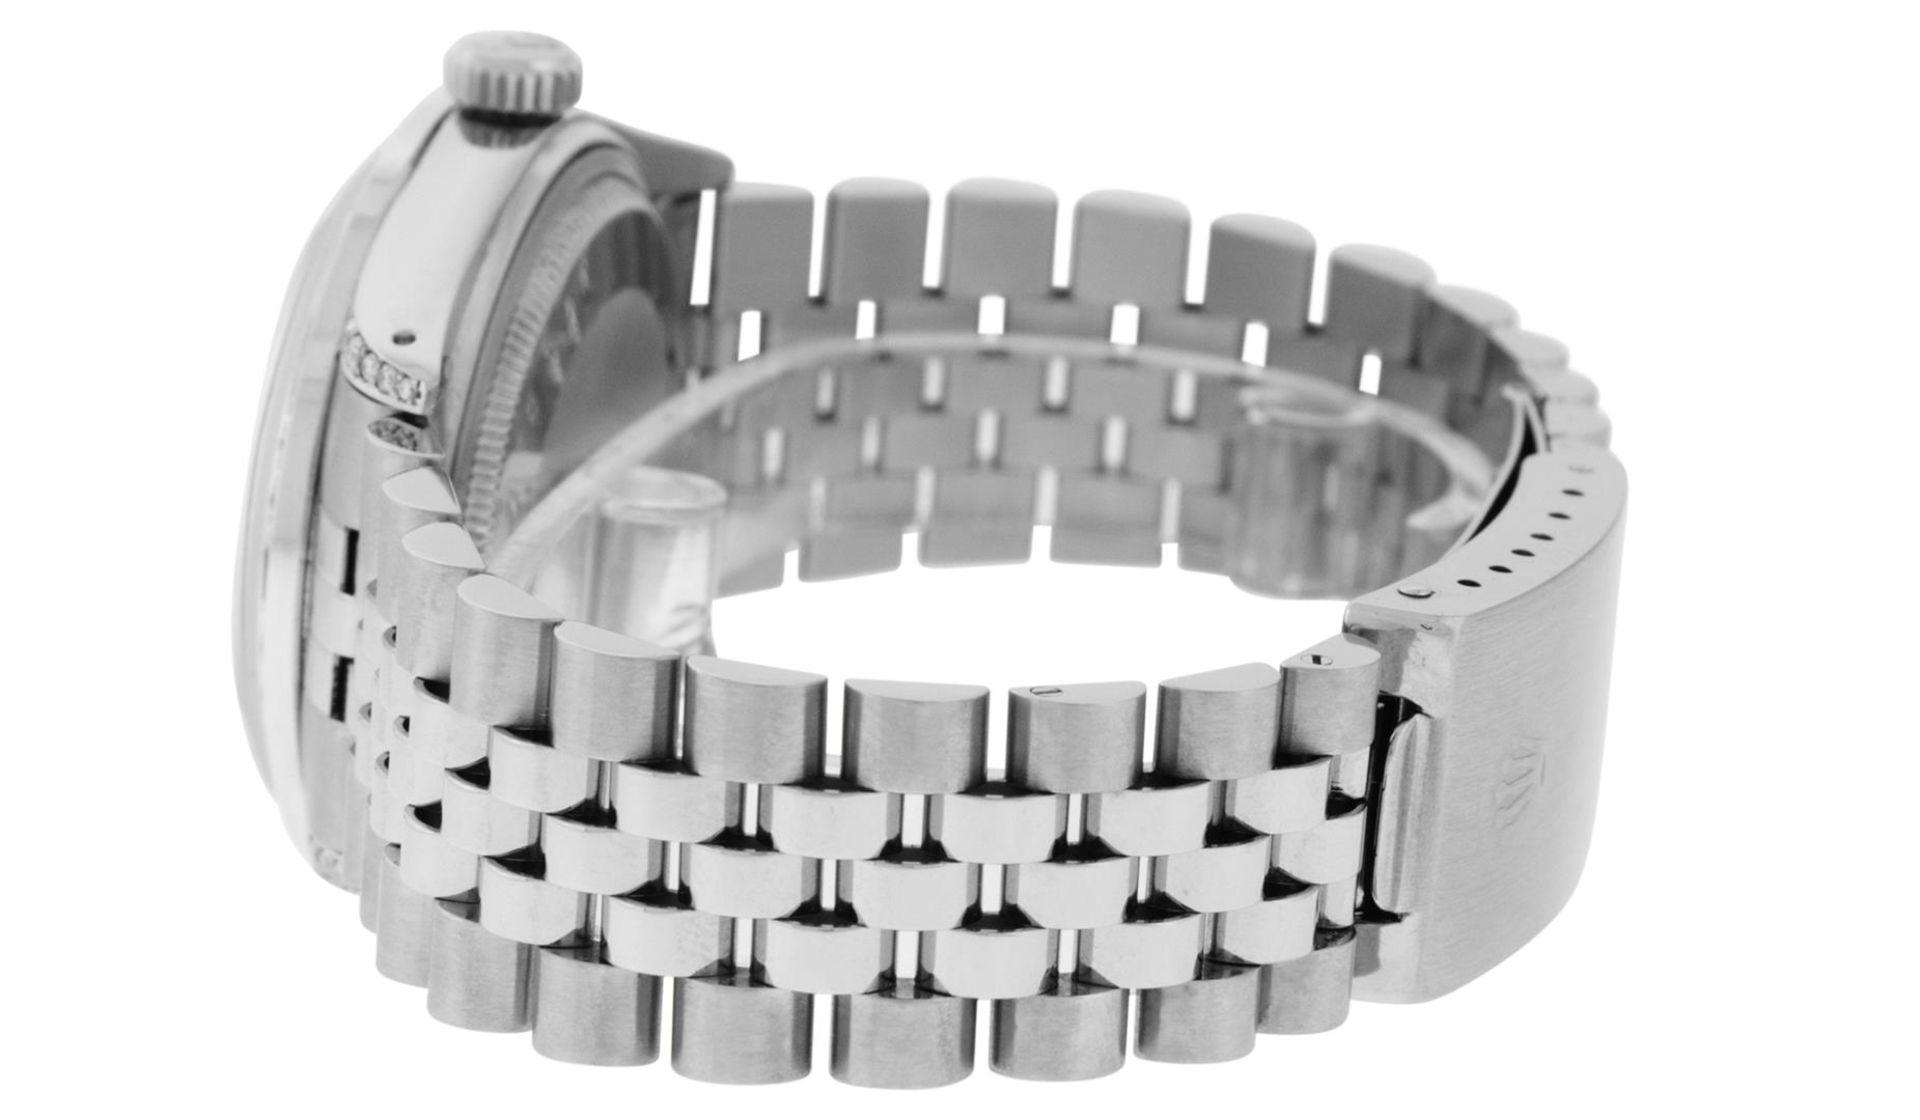 Rolex Mens Stainless Steel Black Diamond Lugs & Sapphire Datejust Wristwatch Oys - Image 4 of 9